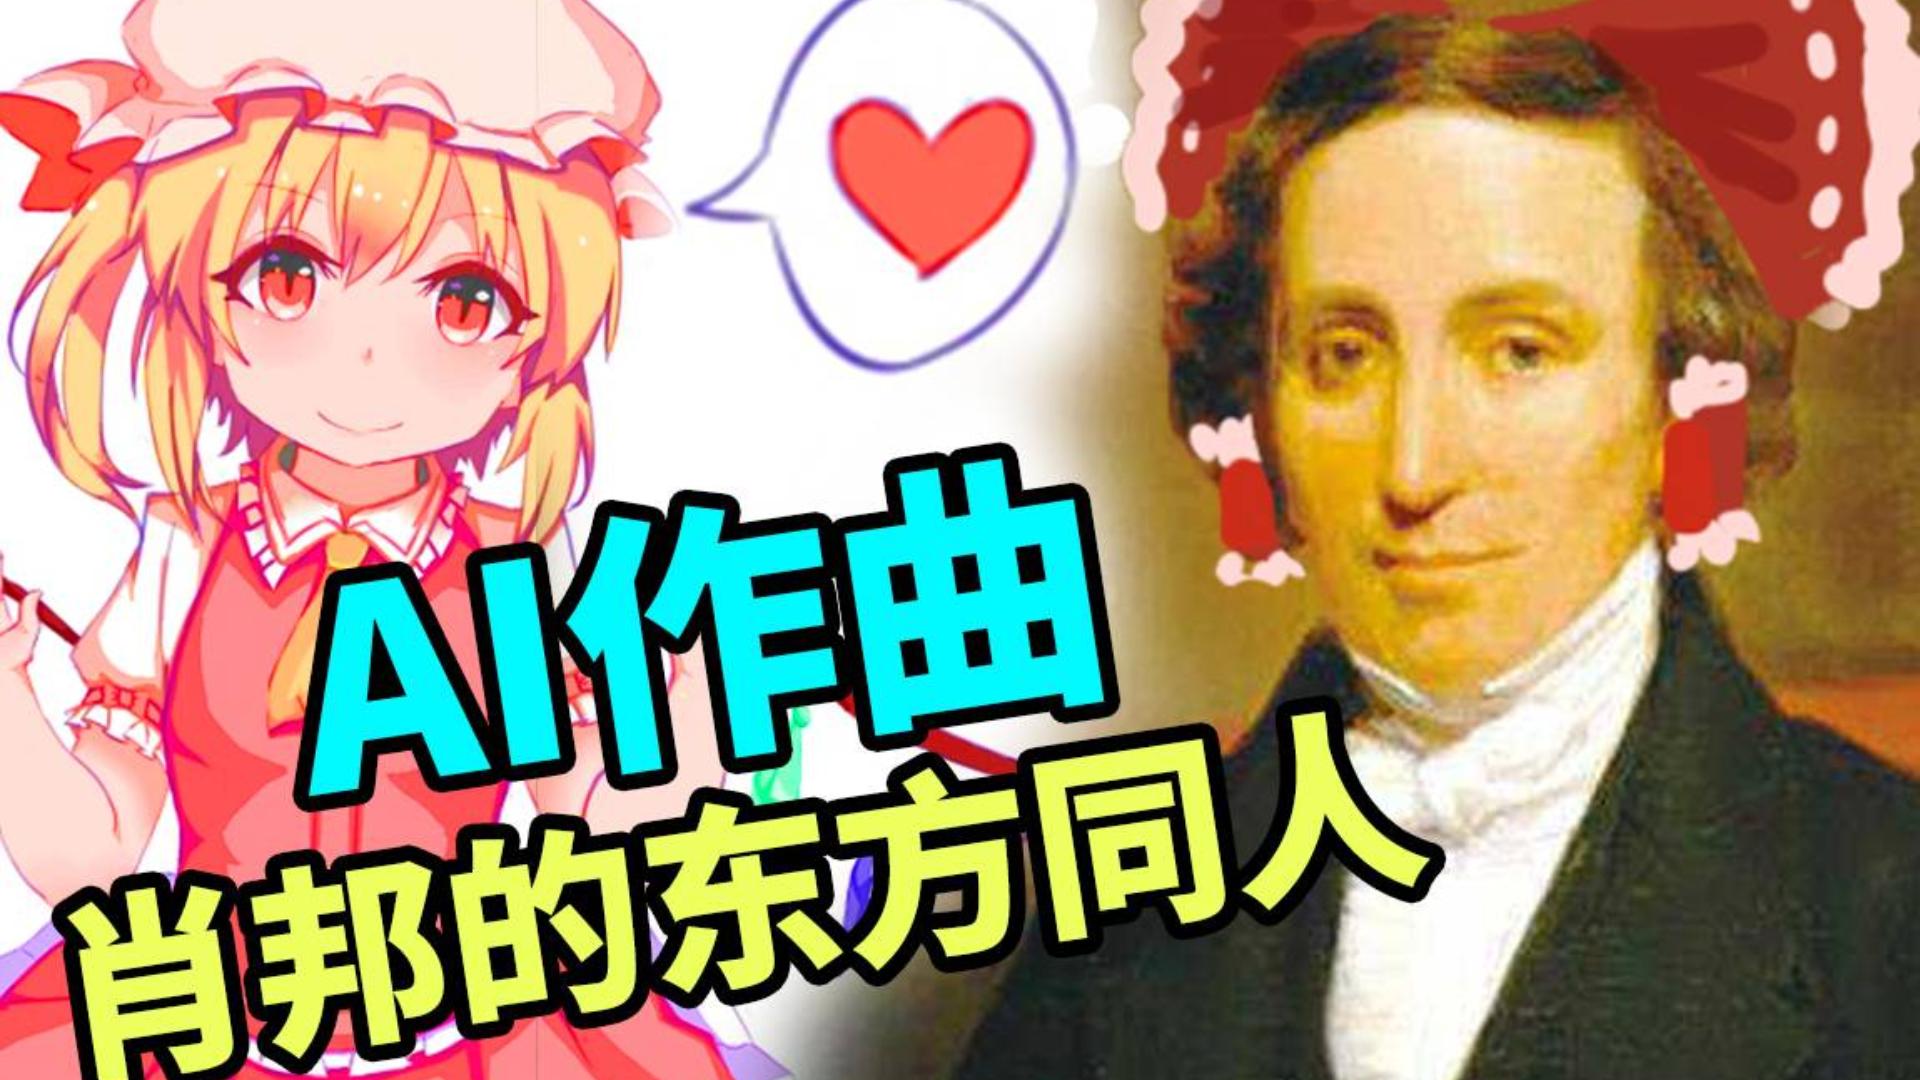 【AI作曲】贝多芬写的东方同人曲竟然是?!人工智能一键作曲!U.N.OWEN【大谷纽约实验室】